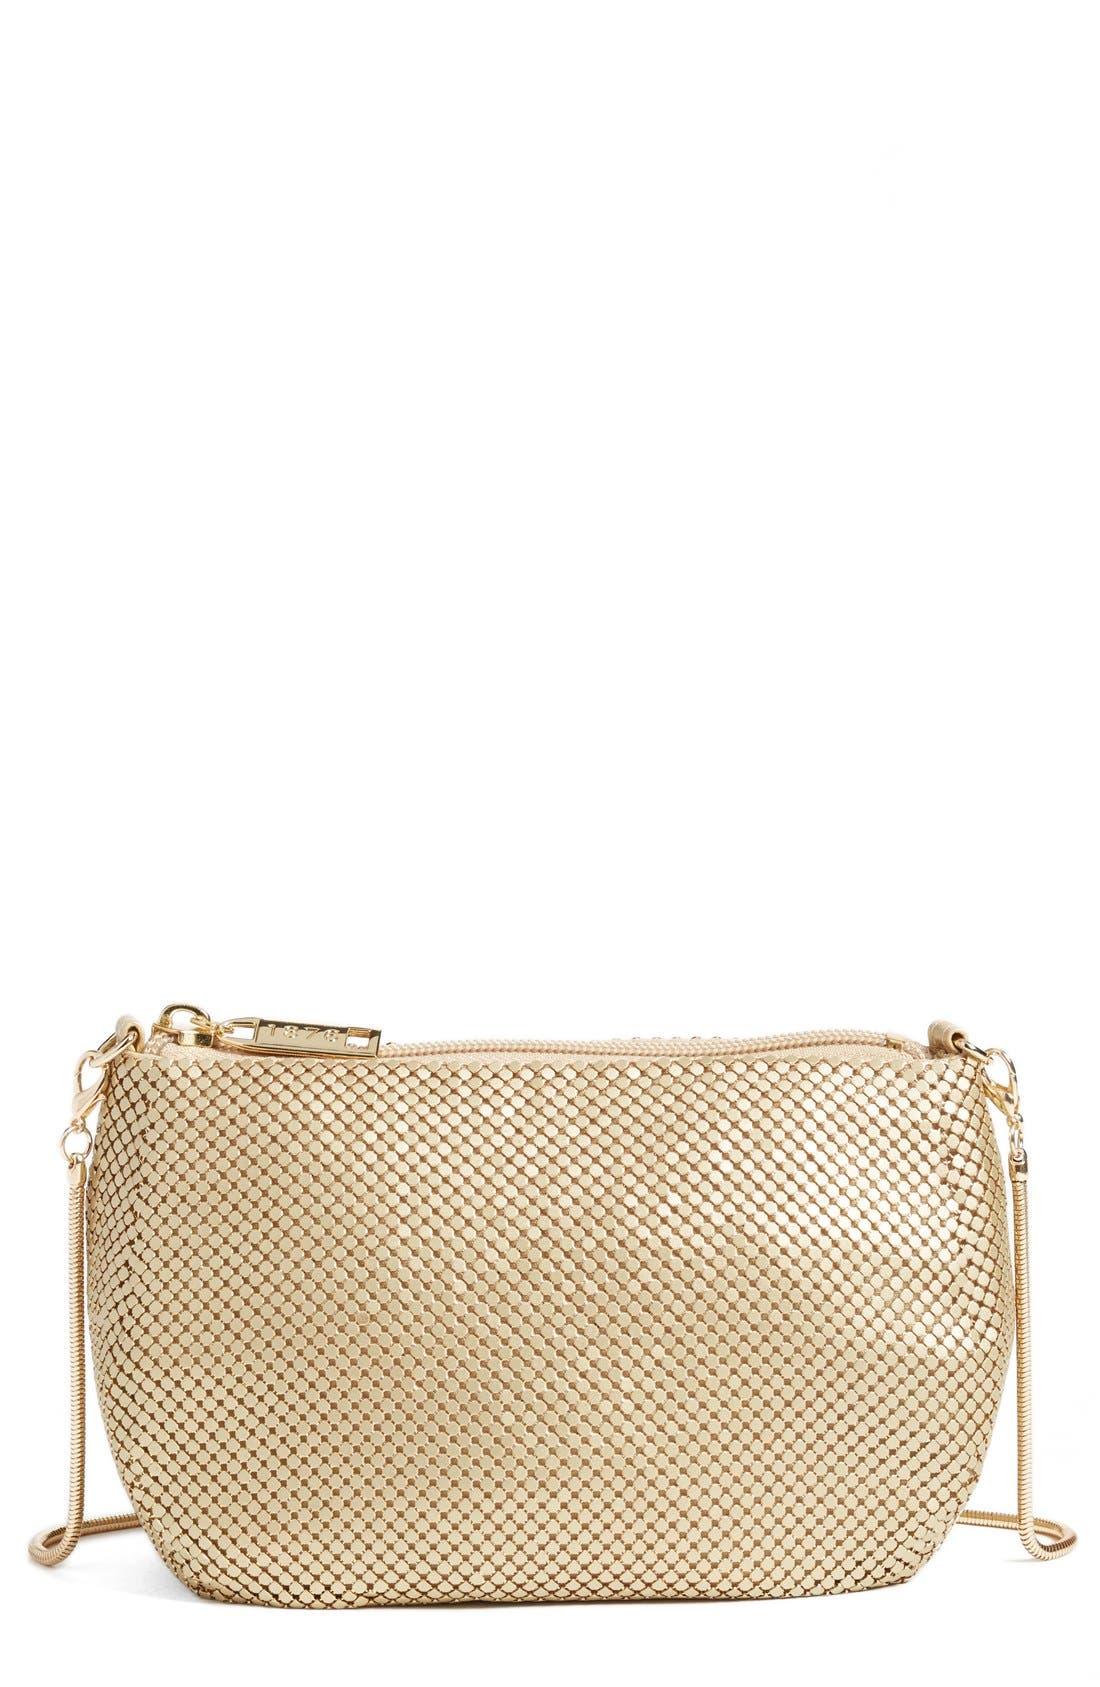 'Matte' Mesh Crossbody Bag,                         Main,                         color, MATTE GOLD